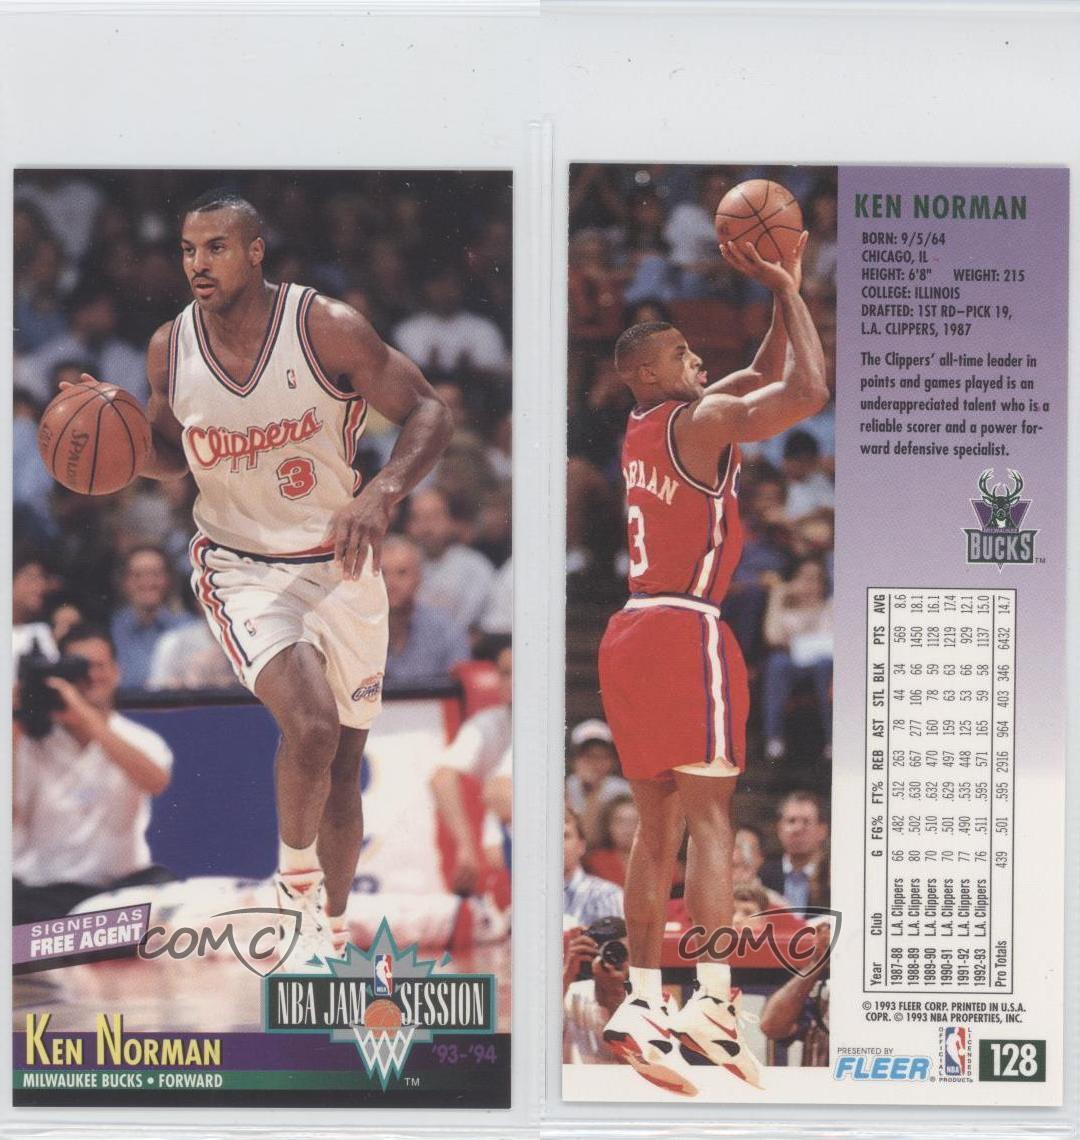 1993-94 NBA Jam Session 128 Ken Norman Milwaukee Bucks Los